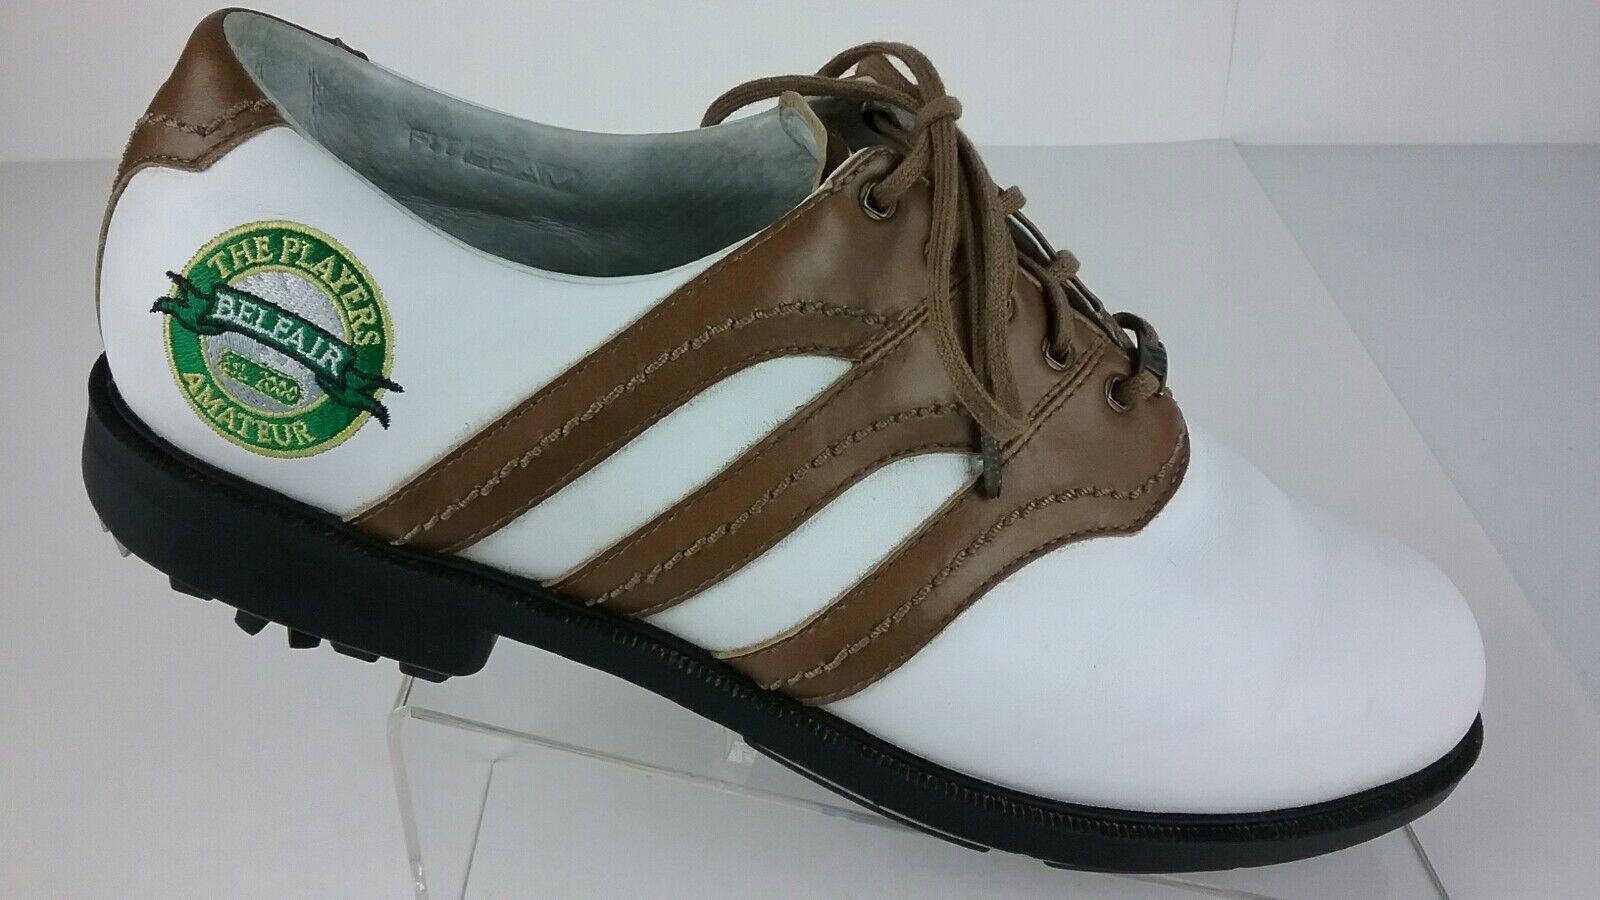 Adidas Traxion Men's 11.5 Golf Shoes Belfair The The Belfair Players Amateur 2000 R1-S 6 69f127